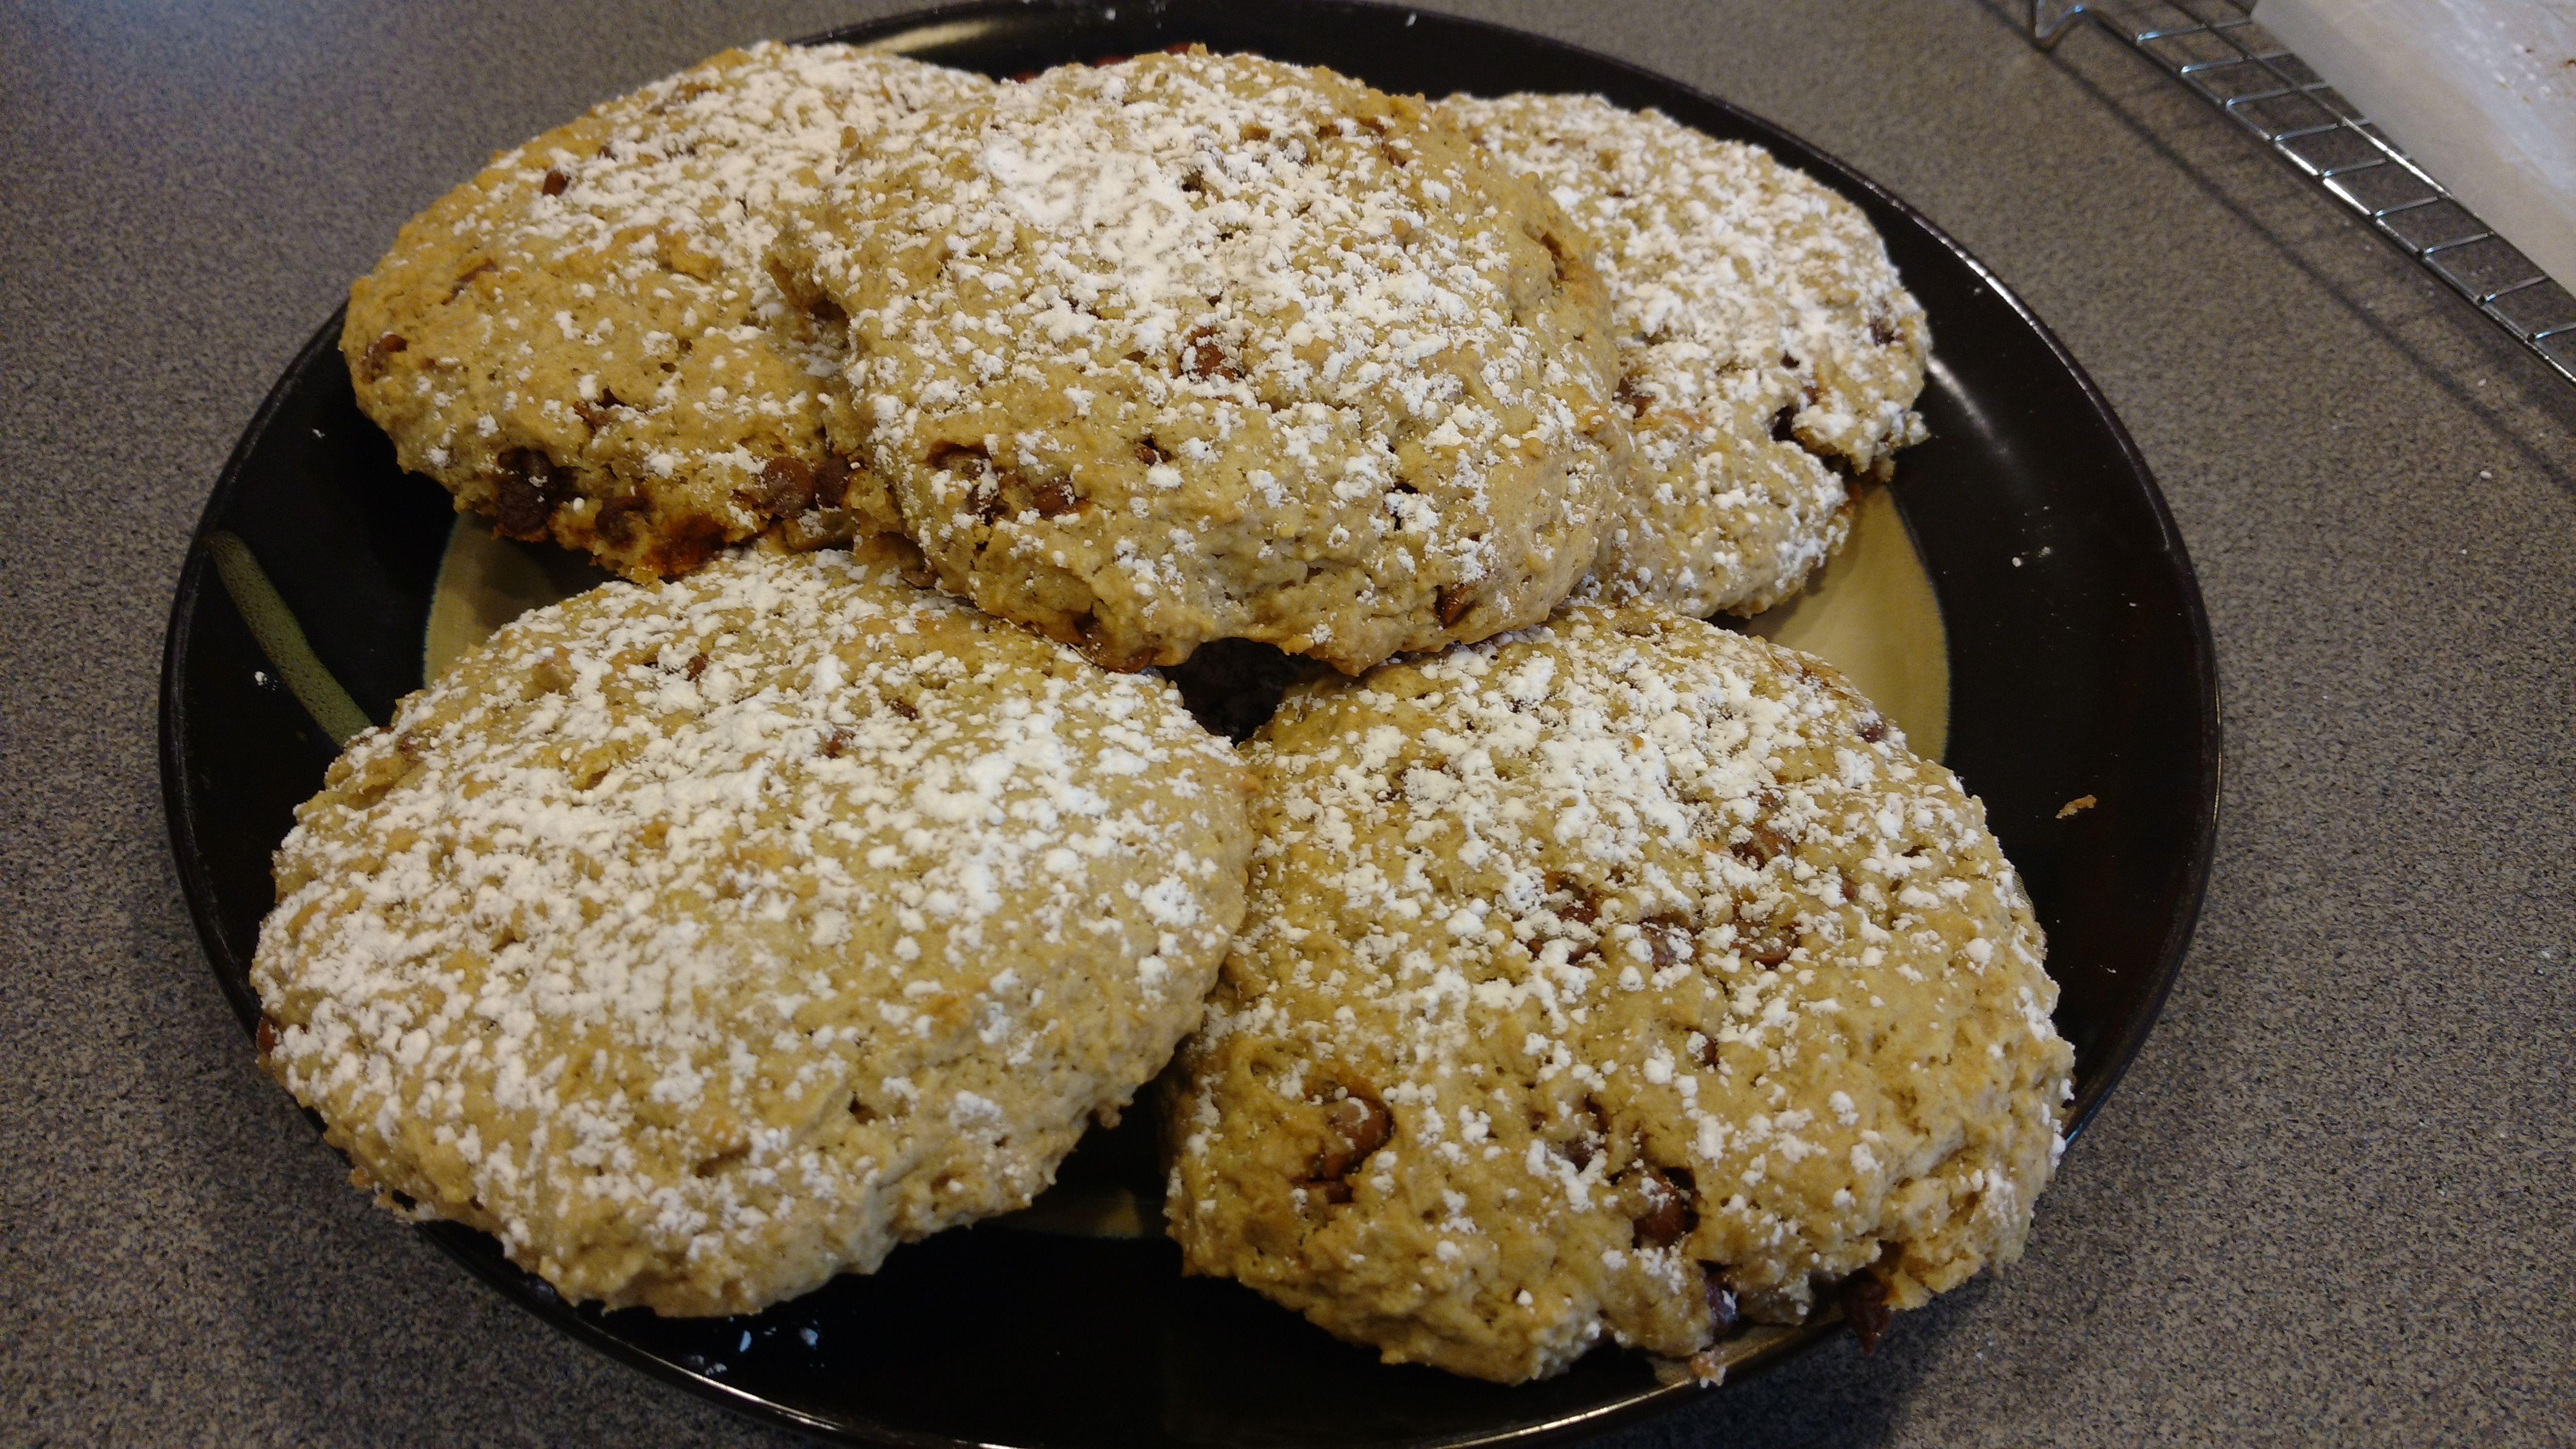 Buttermilk Oatmeal Scones Recipe In 2020 Oatmeal Scones Cinnamon Oatmeal Muffins Scones